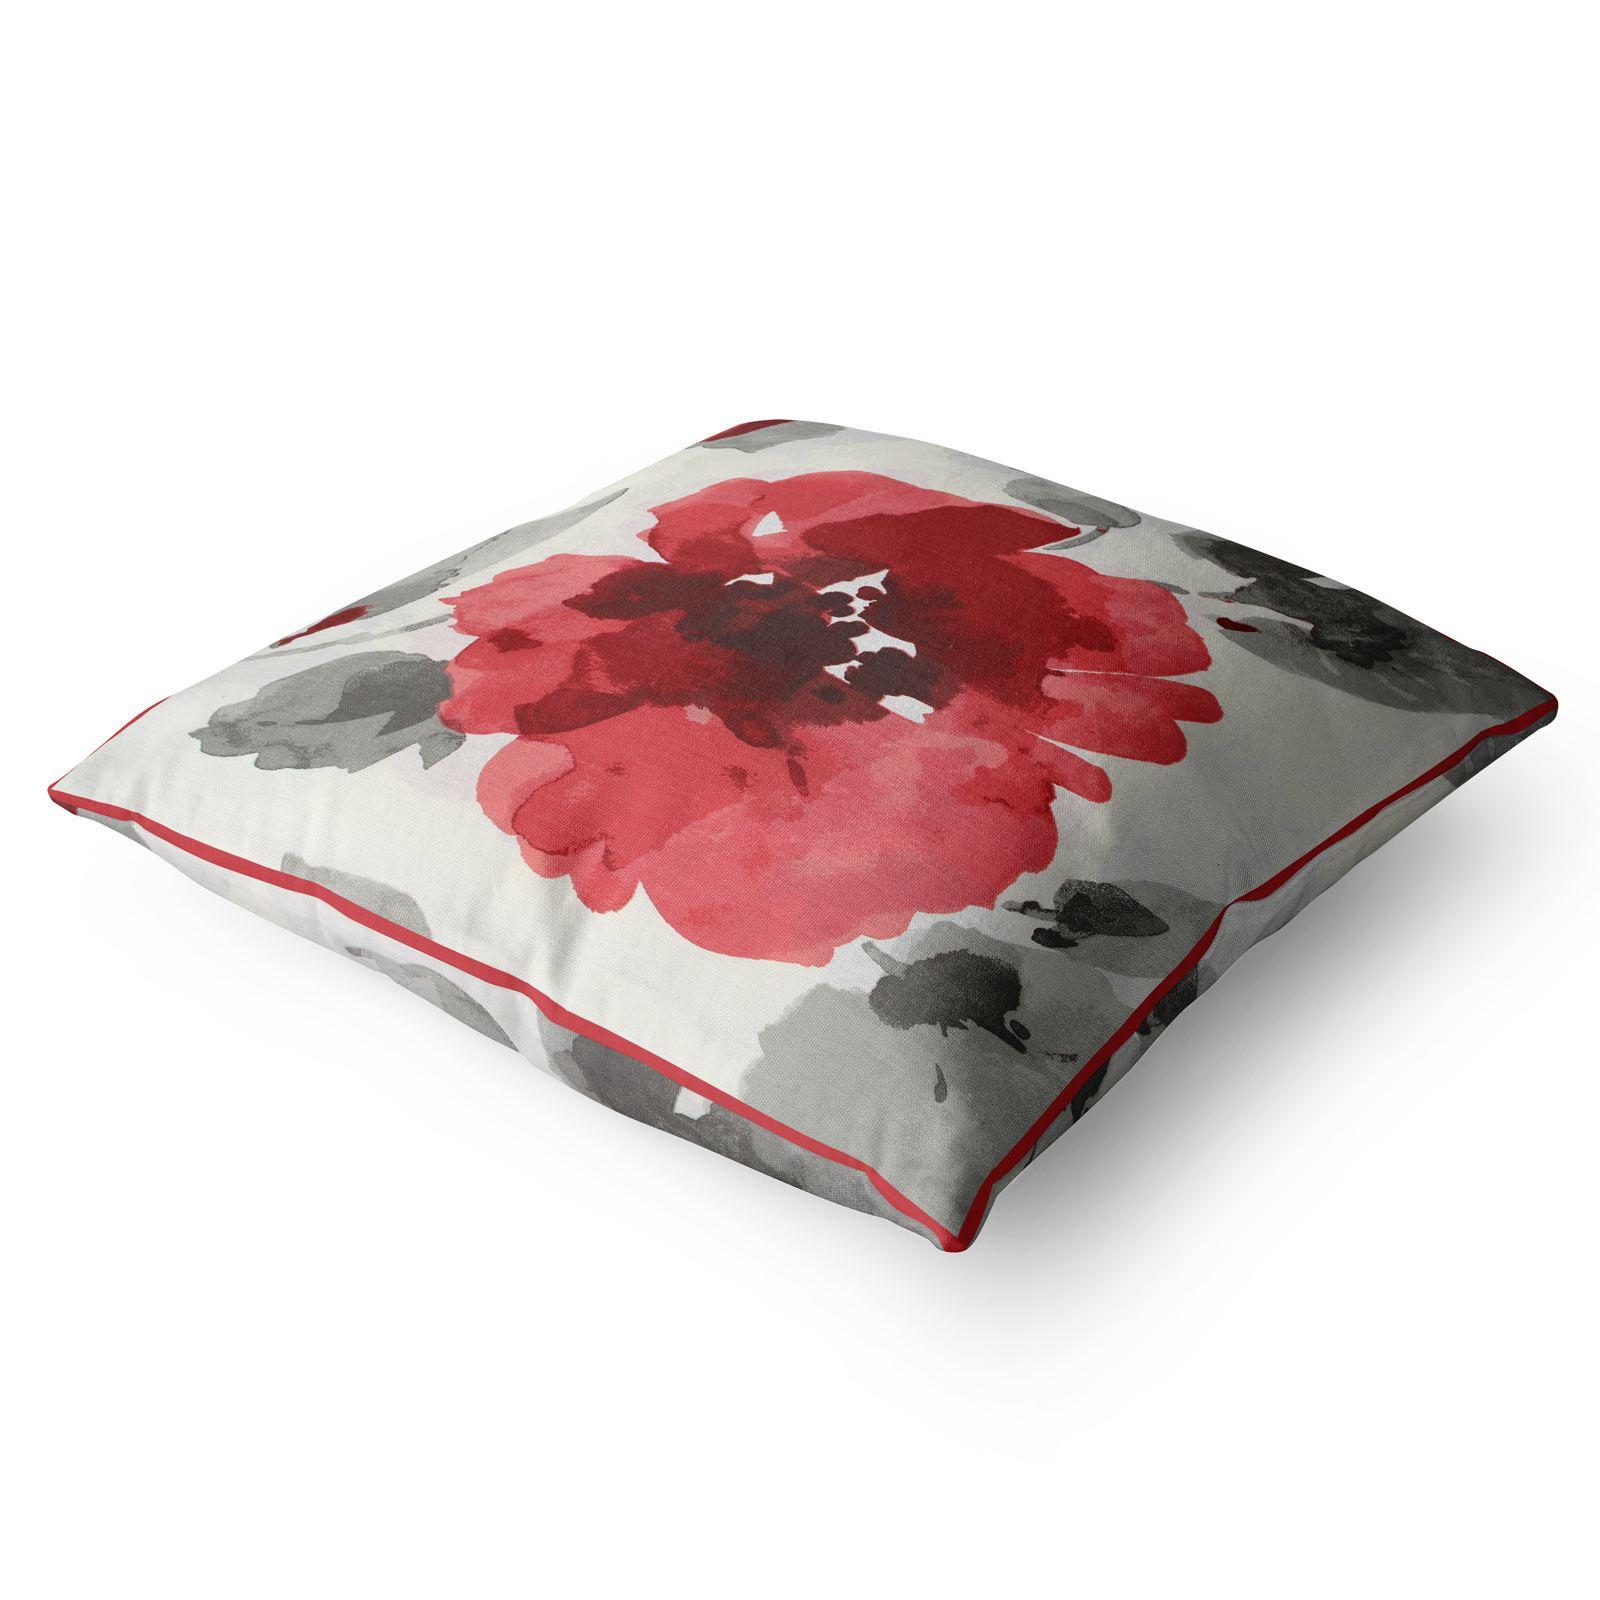 Vino-Tinto-Cushion-Covers-Coleccion-17-034-18-034-43cm-45cm-Cubierta miniatura 9